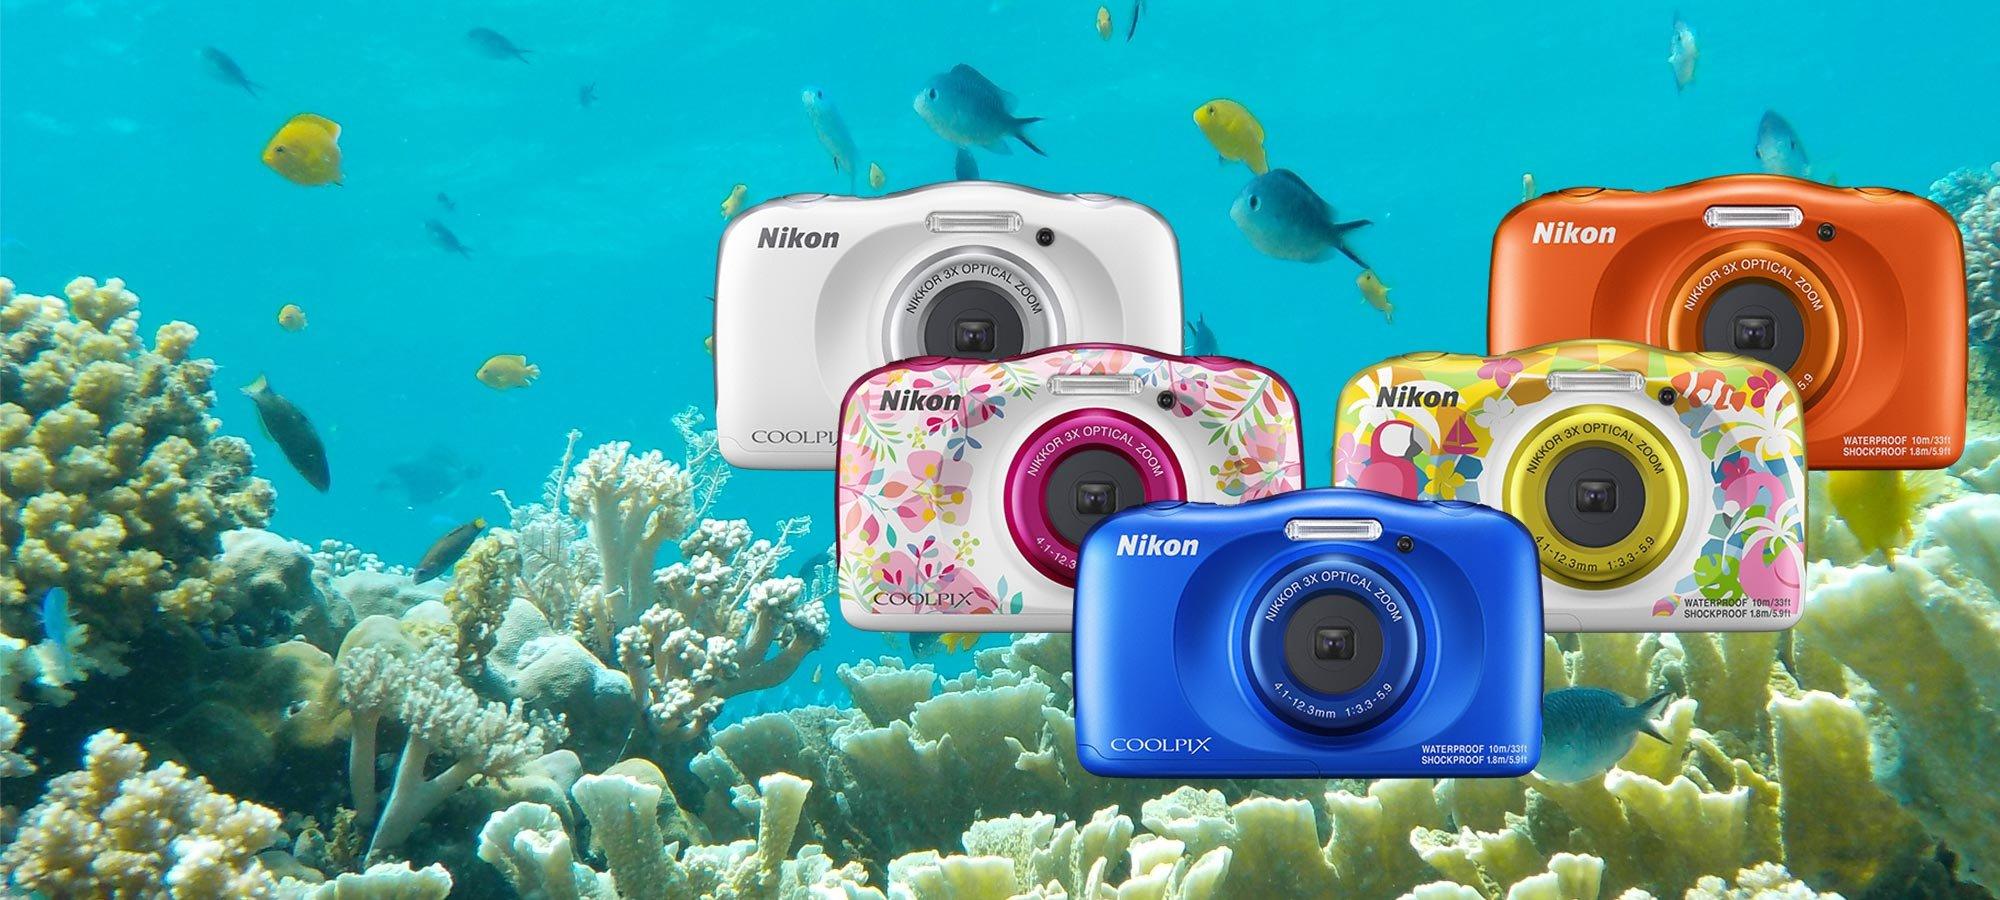 Nikon UK: Digital Cameras, Lens & Photography Accessories